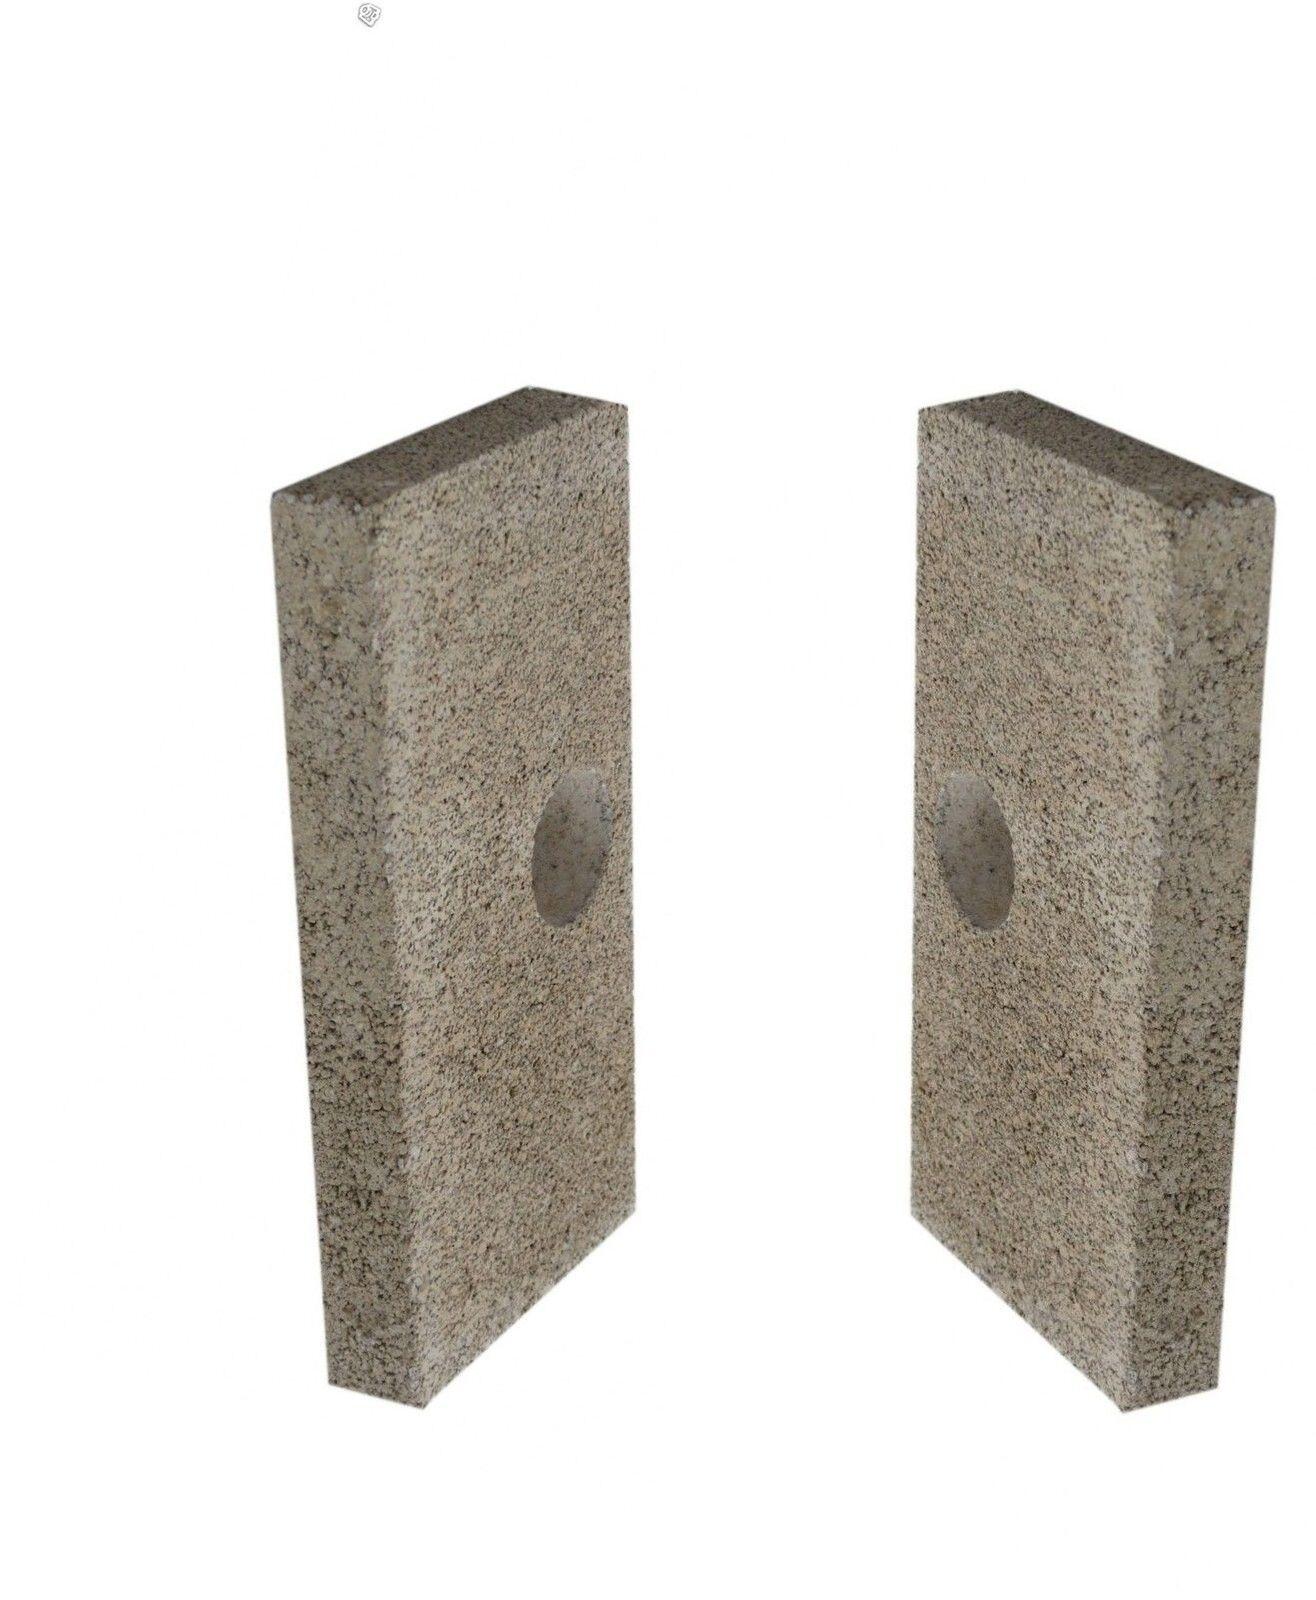 Wood Stove Fire Bricks 4 9 : Quadrafire wood stove fire bricks w holes pp srv